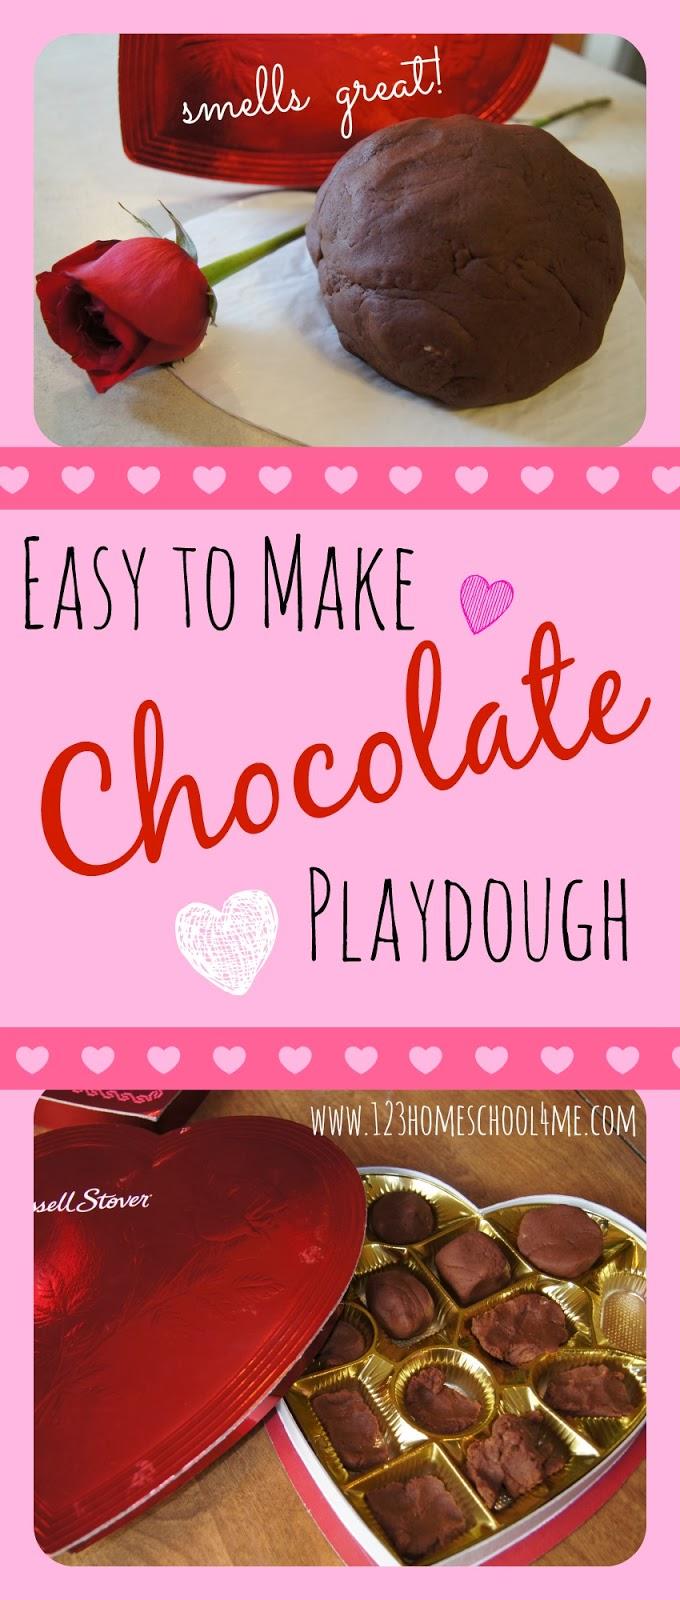 Easy Chocolate Playdough Recipe For Valentines Day